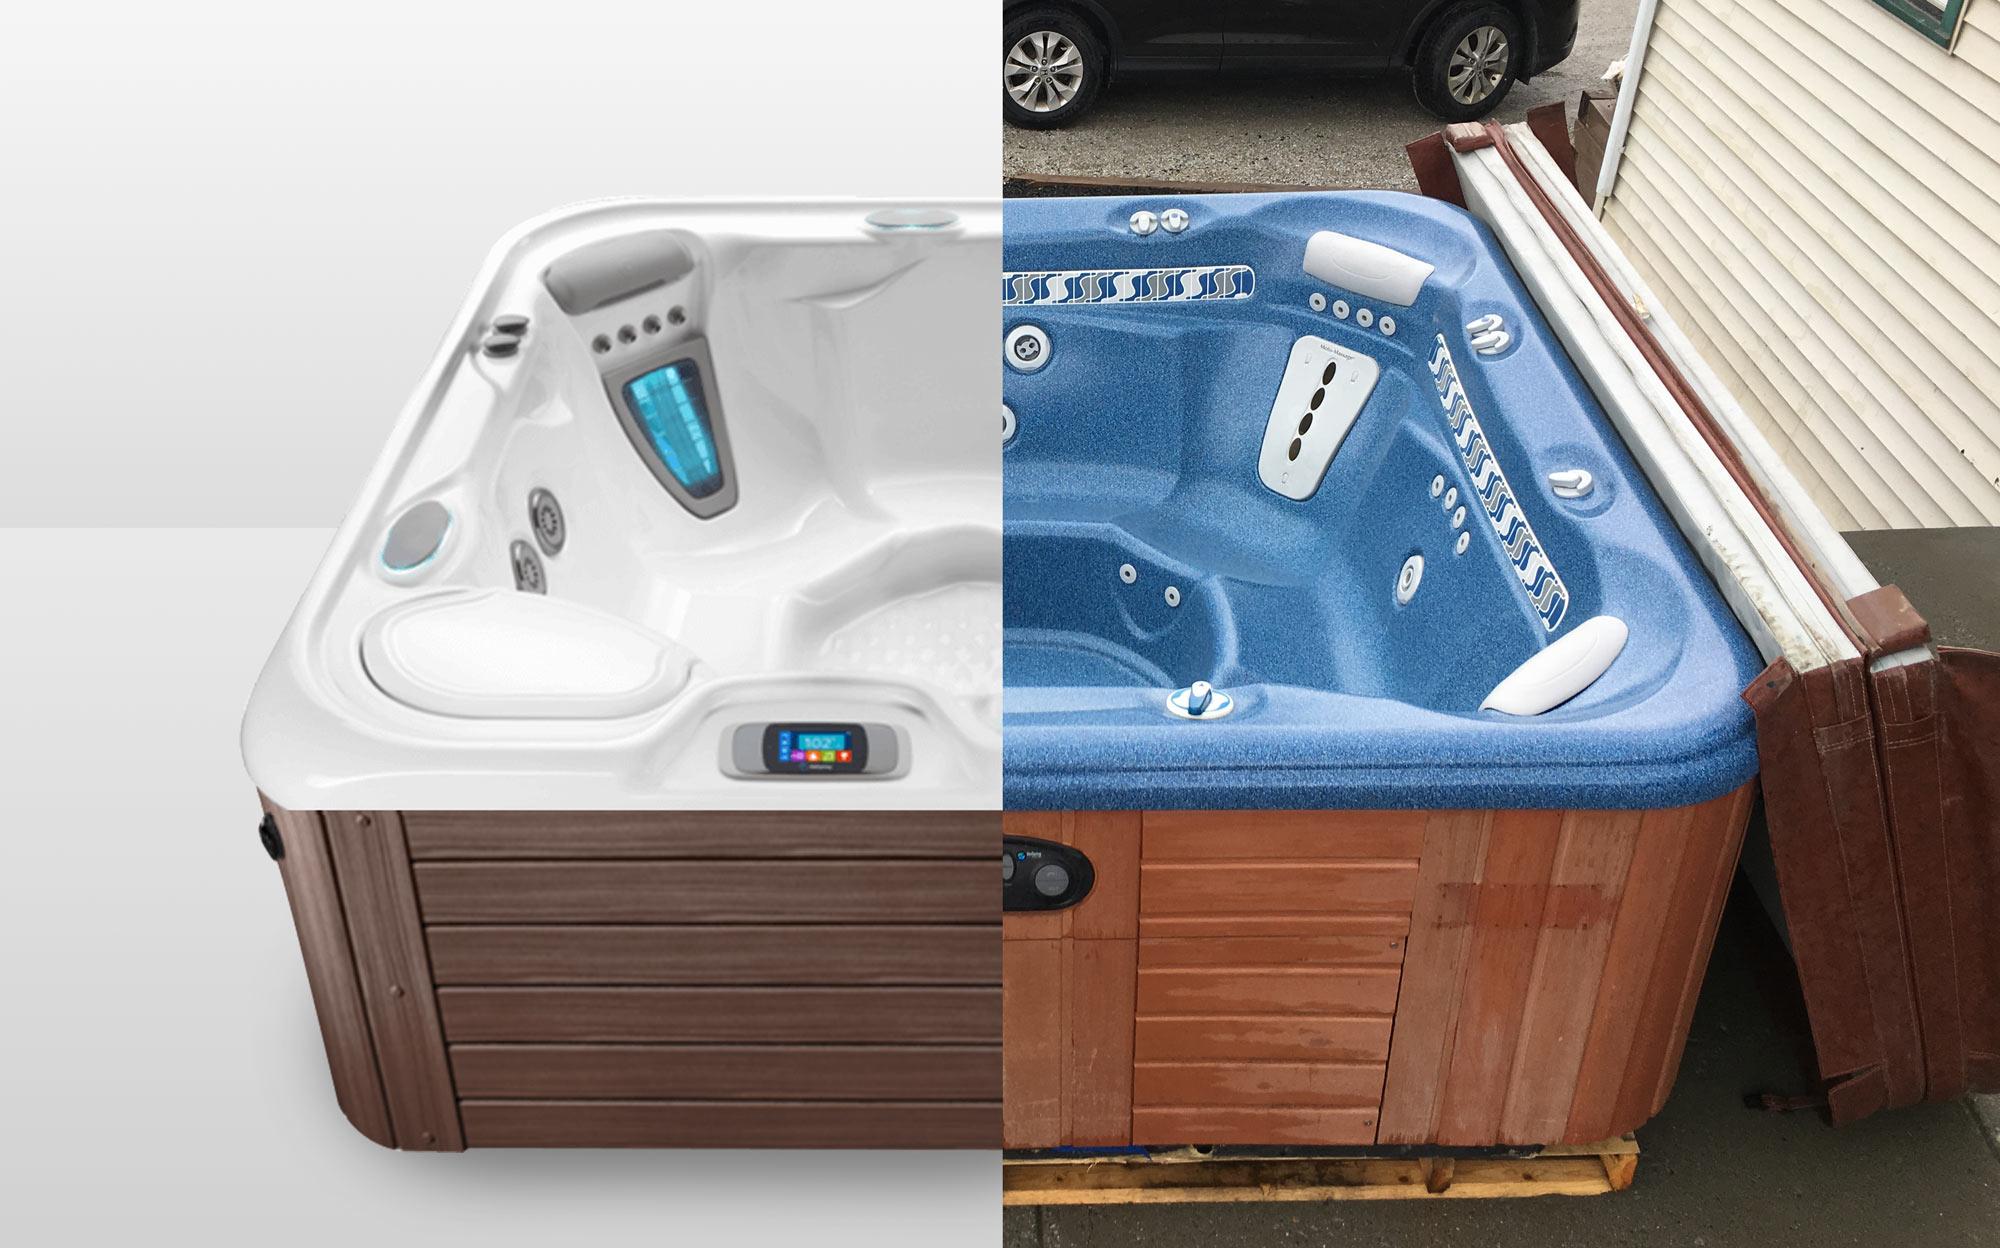 hot tub split view